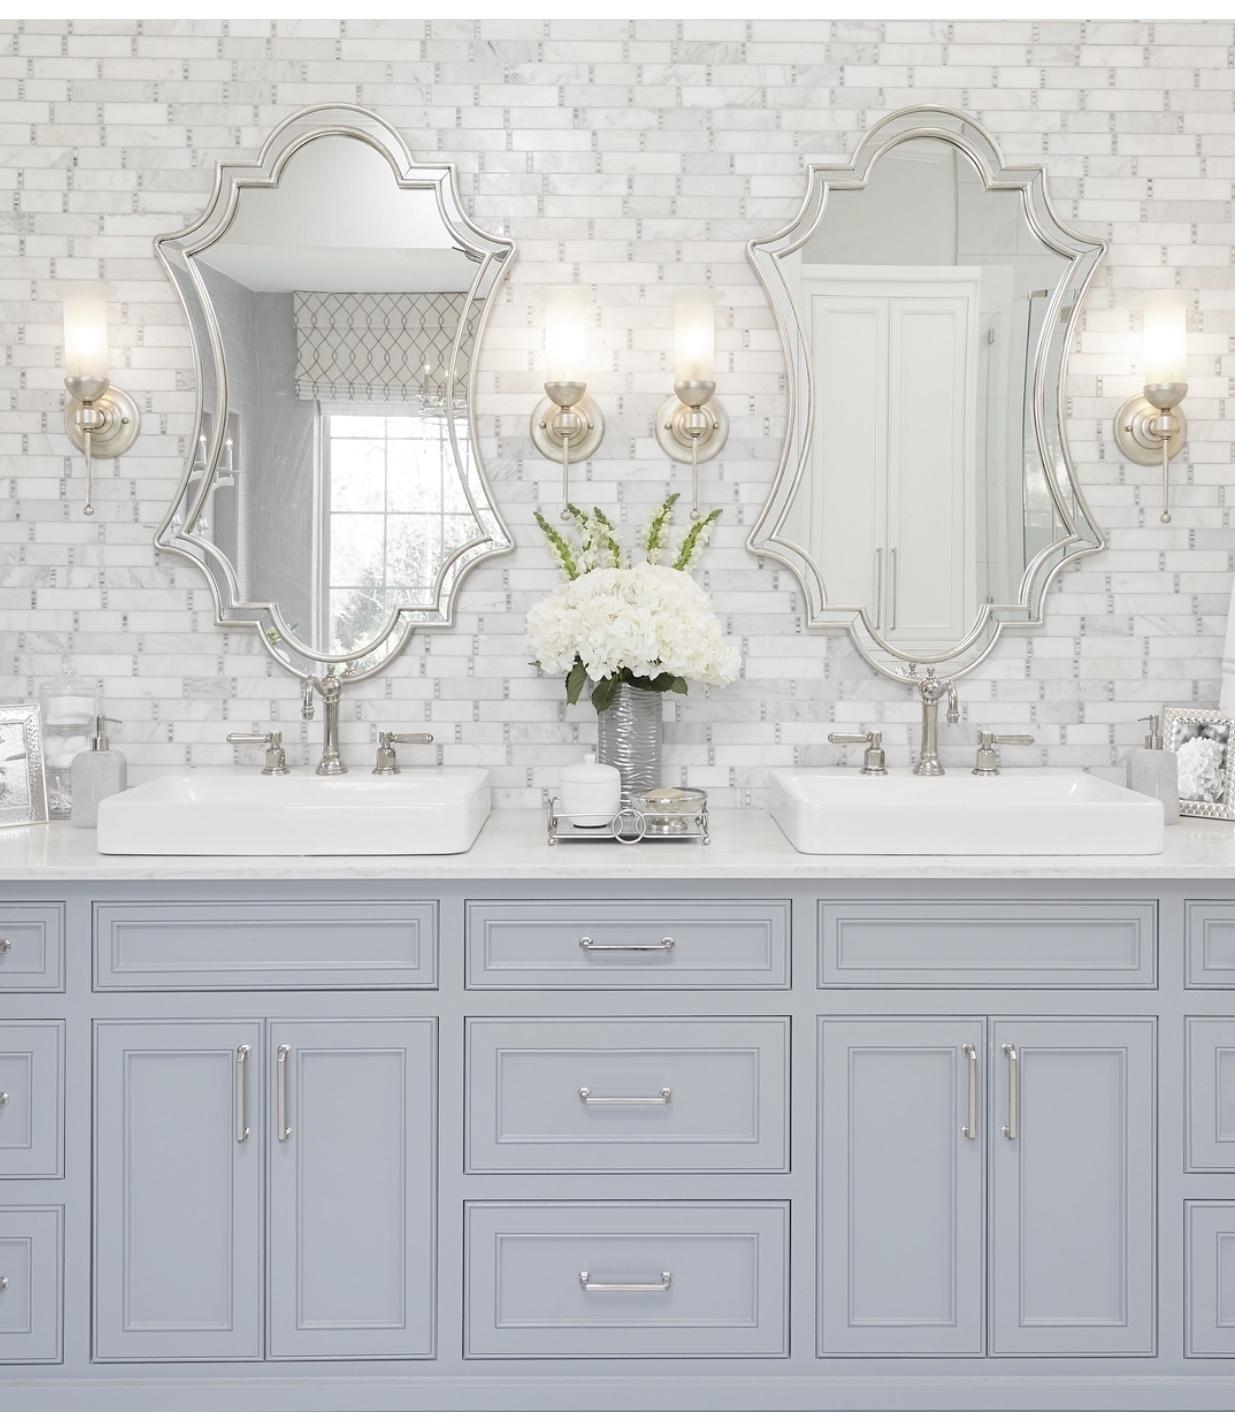 Diy Easy Bathroom Tile Wall Frills And Drills